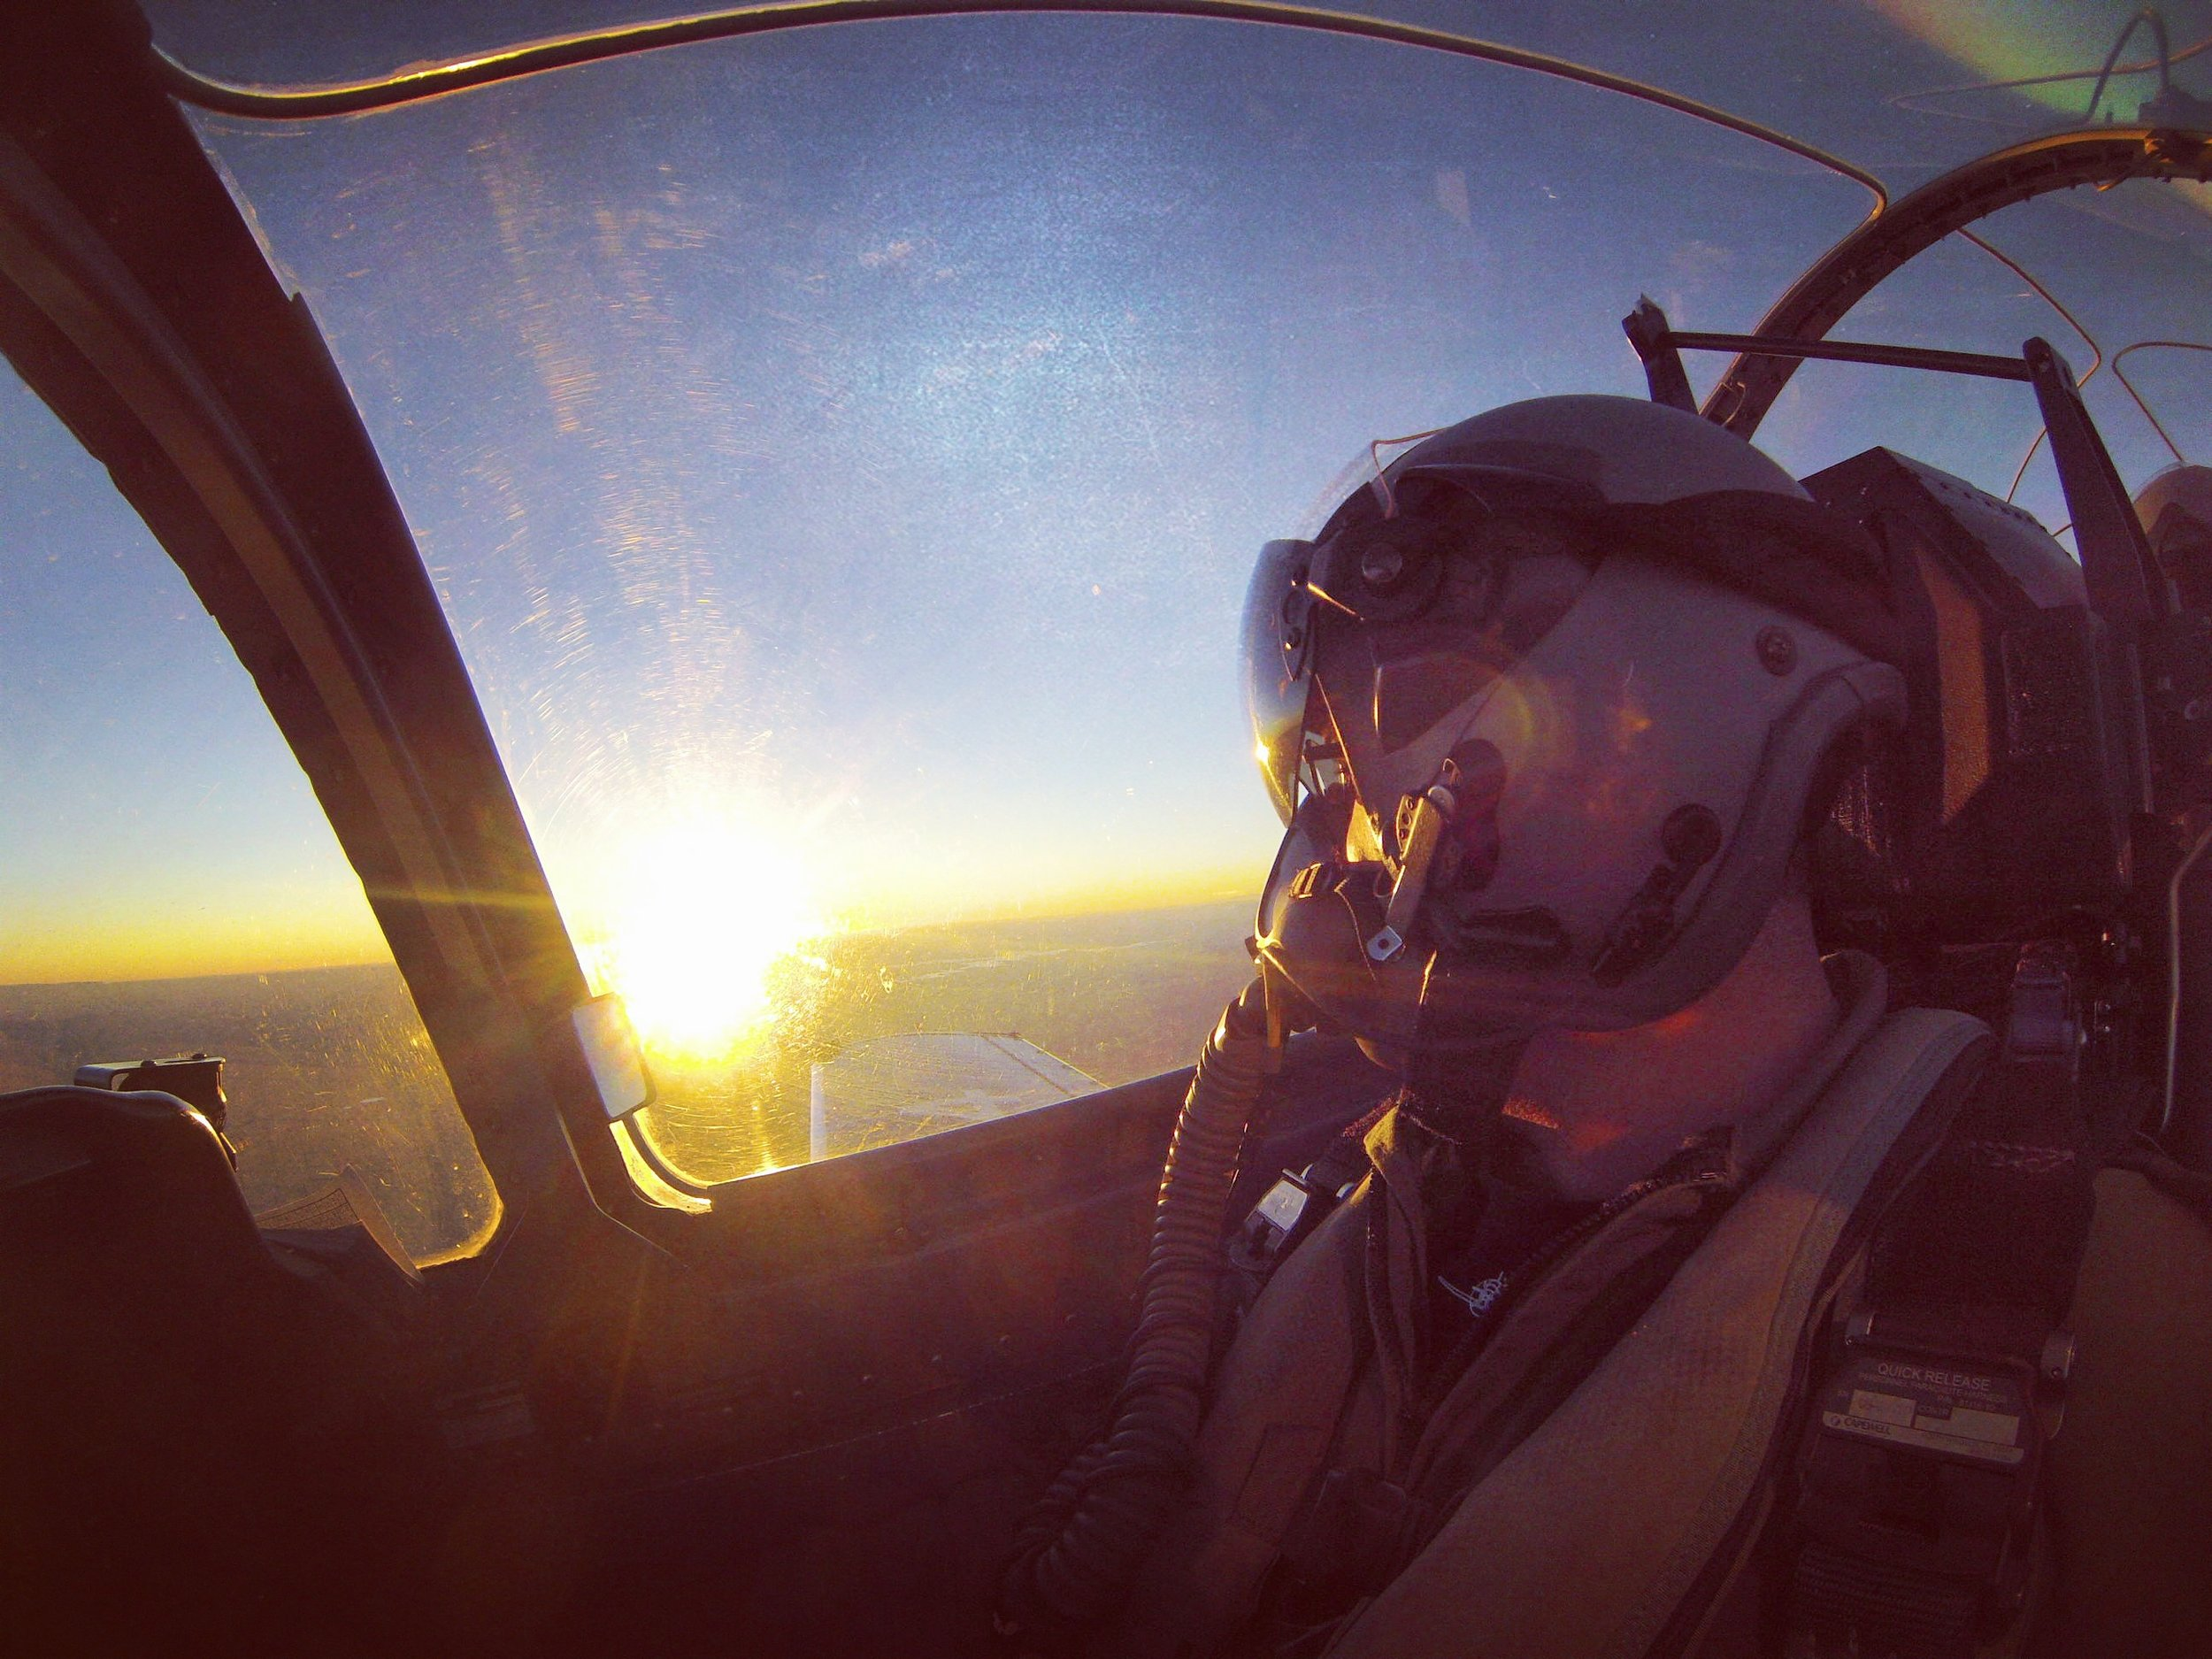 Flying into Denver, CO at sunset